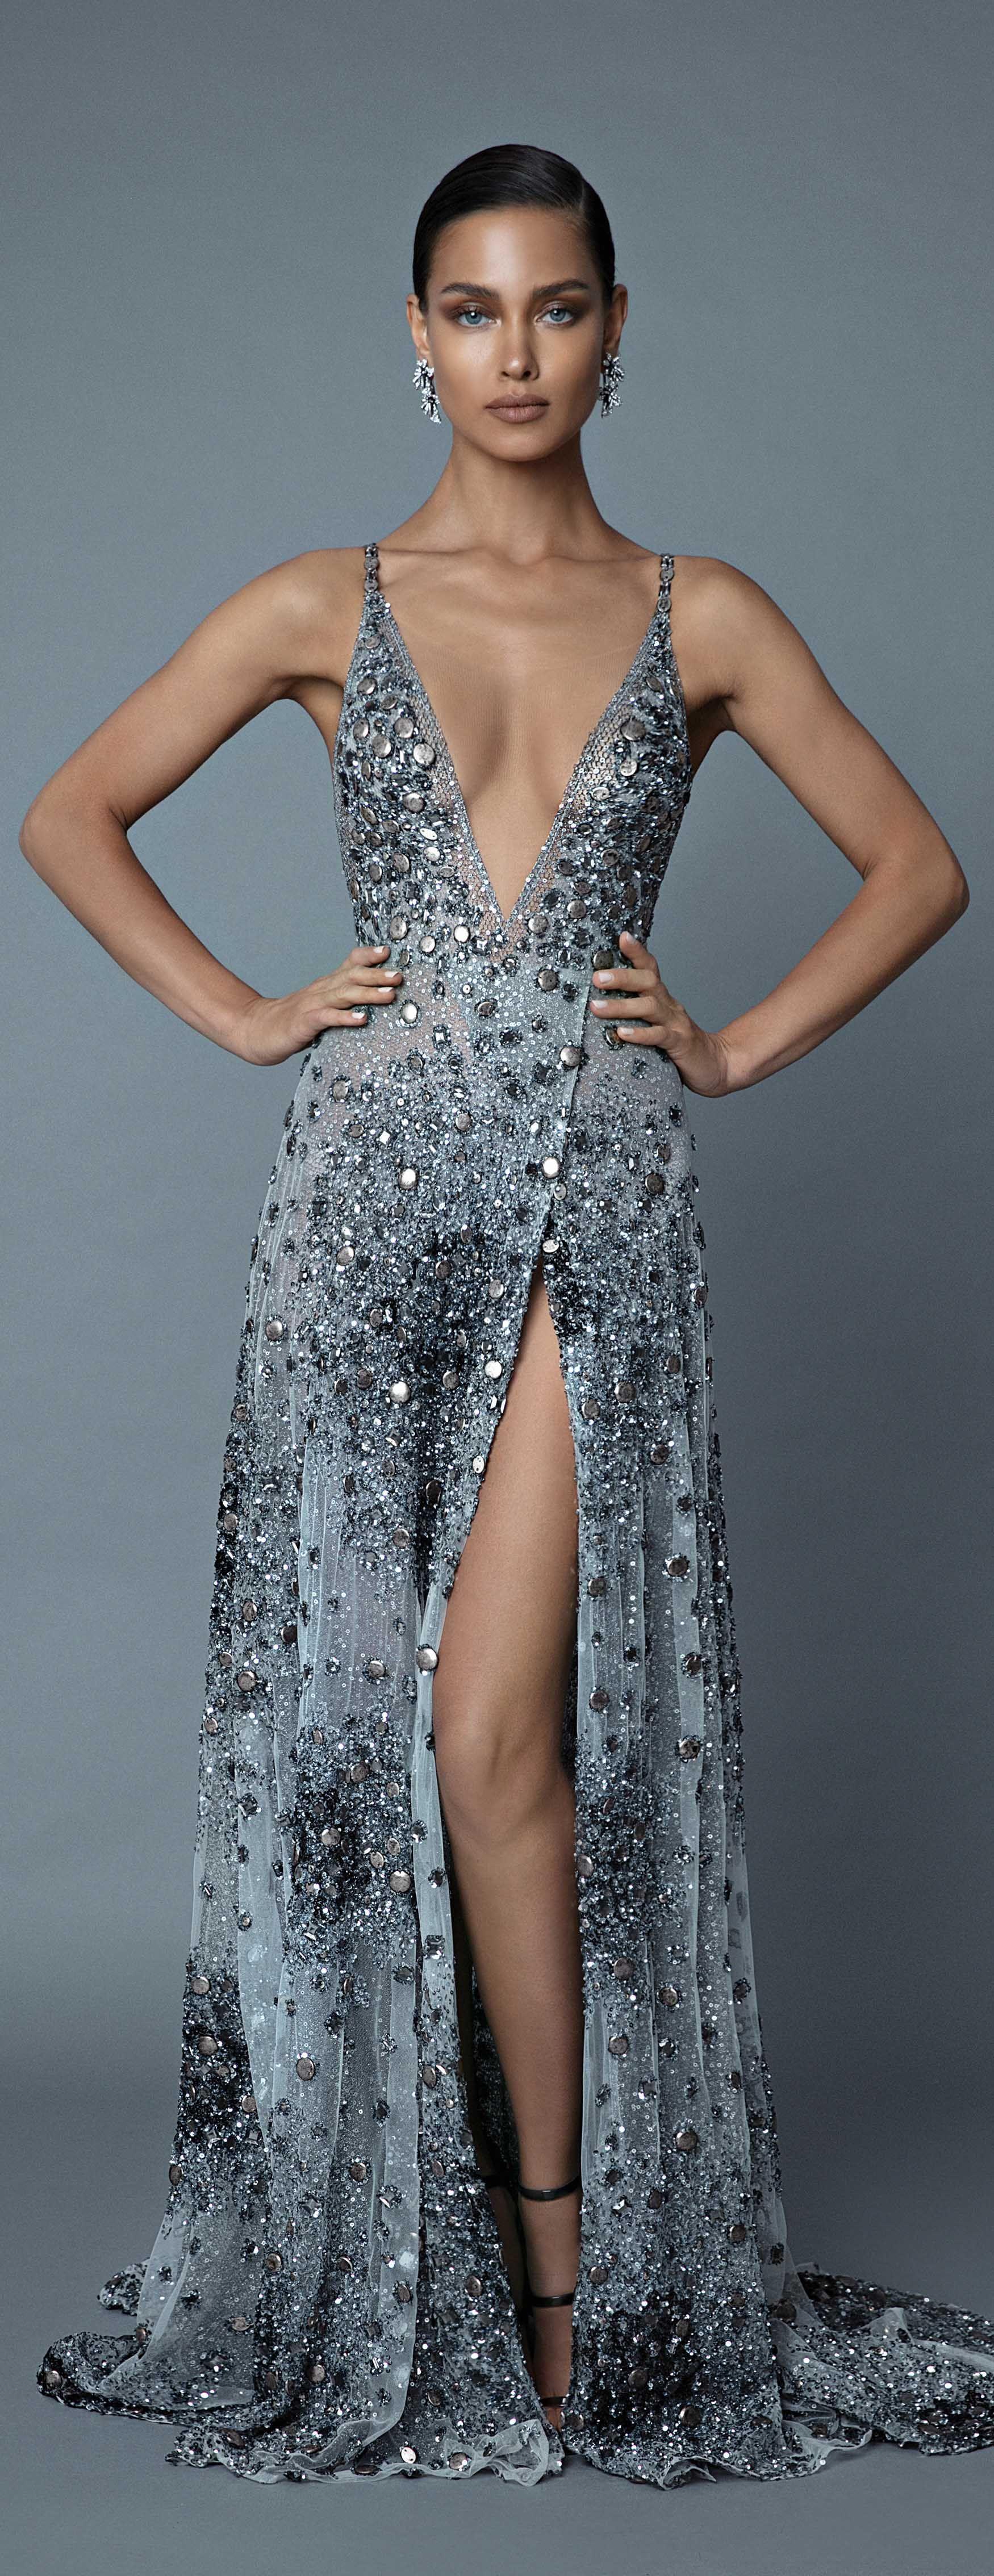 2019 Berta Evening Haute Couture Fashion Dresses Formal Couture Dresses Evening Gowns [ 4536 x 1750 Pixel ]